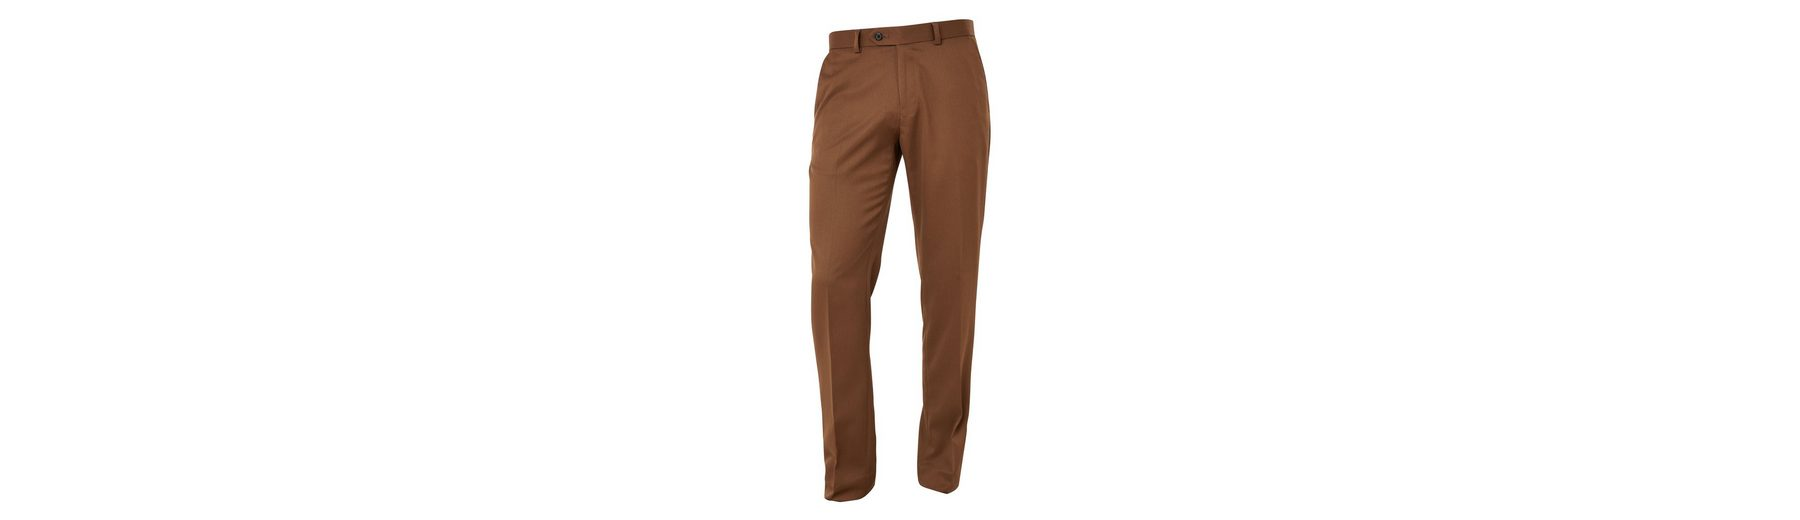 ohne Next Hose ohne Hose Next ohne Next Hose Bundfalte Bundfalte Bundfalte Next wxIgw74qS